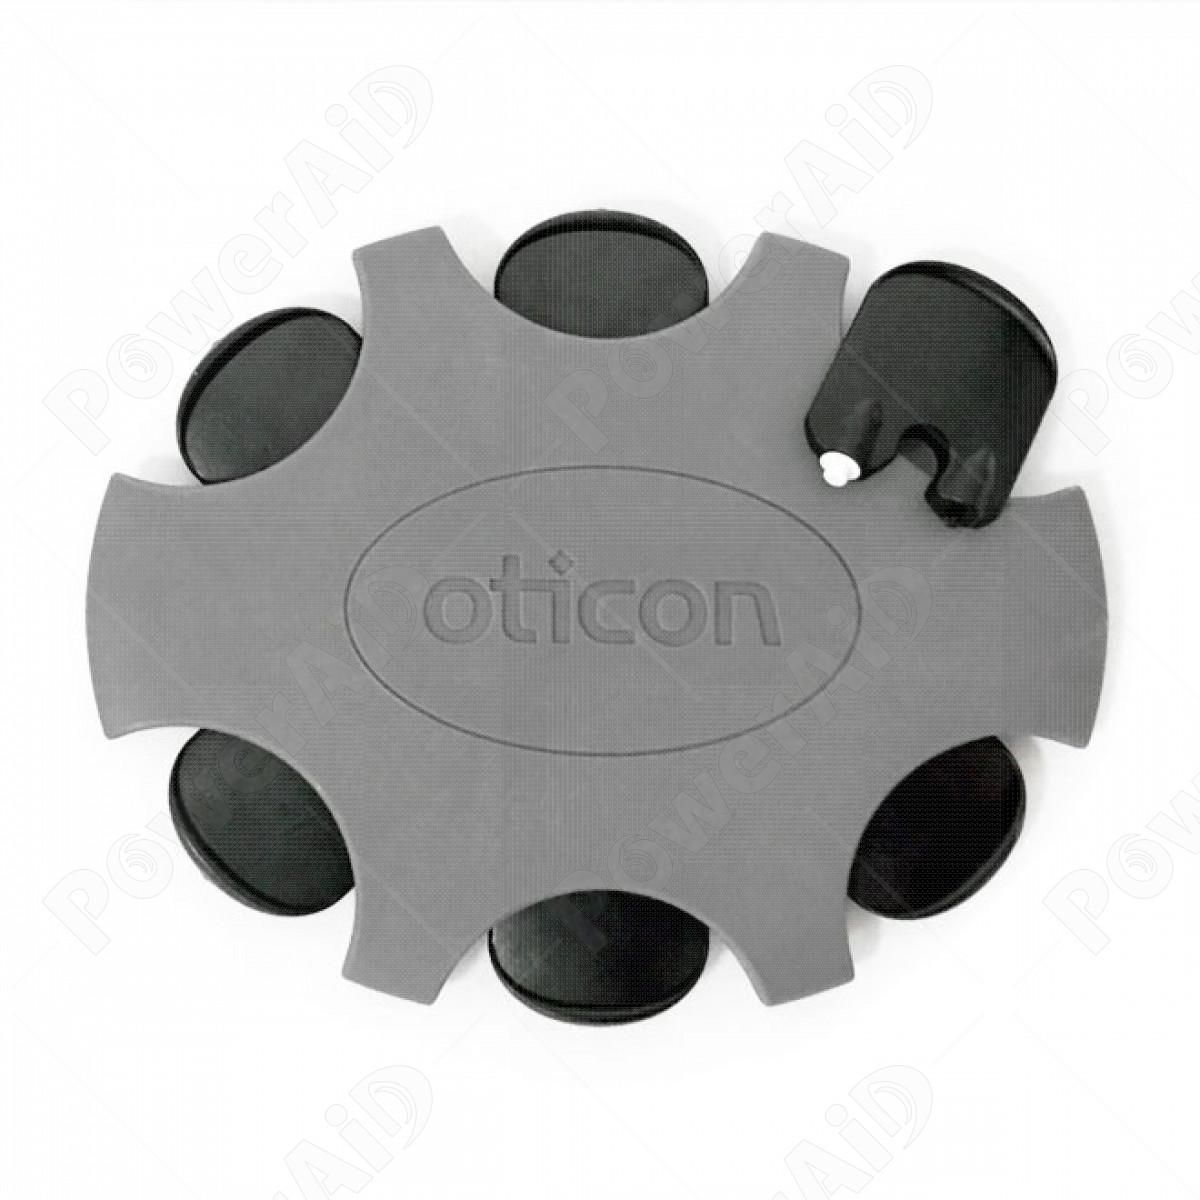 Oticon - Paracerume ProWax miniFit